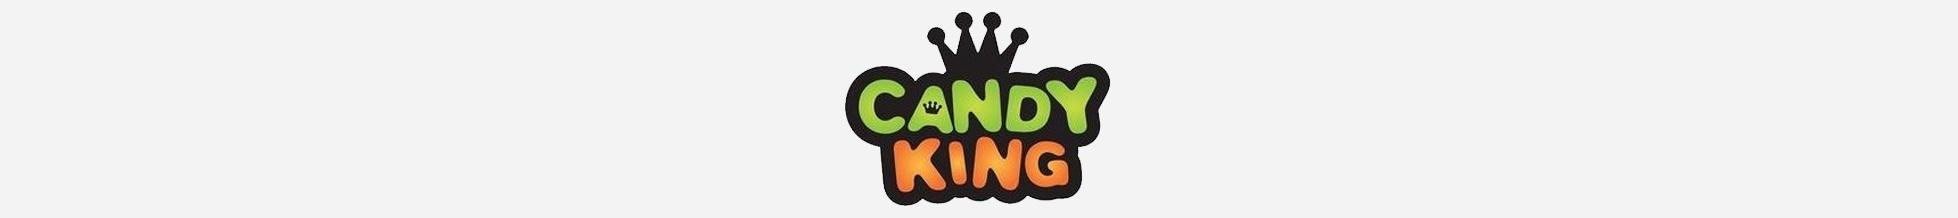 candy-king-salt.jpg